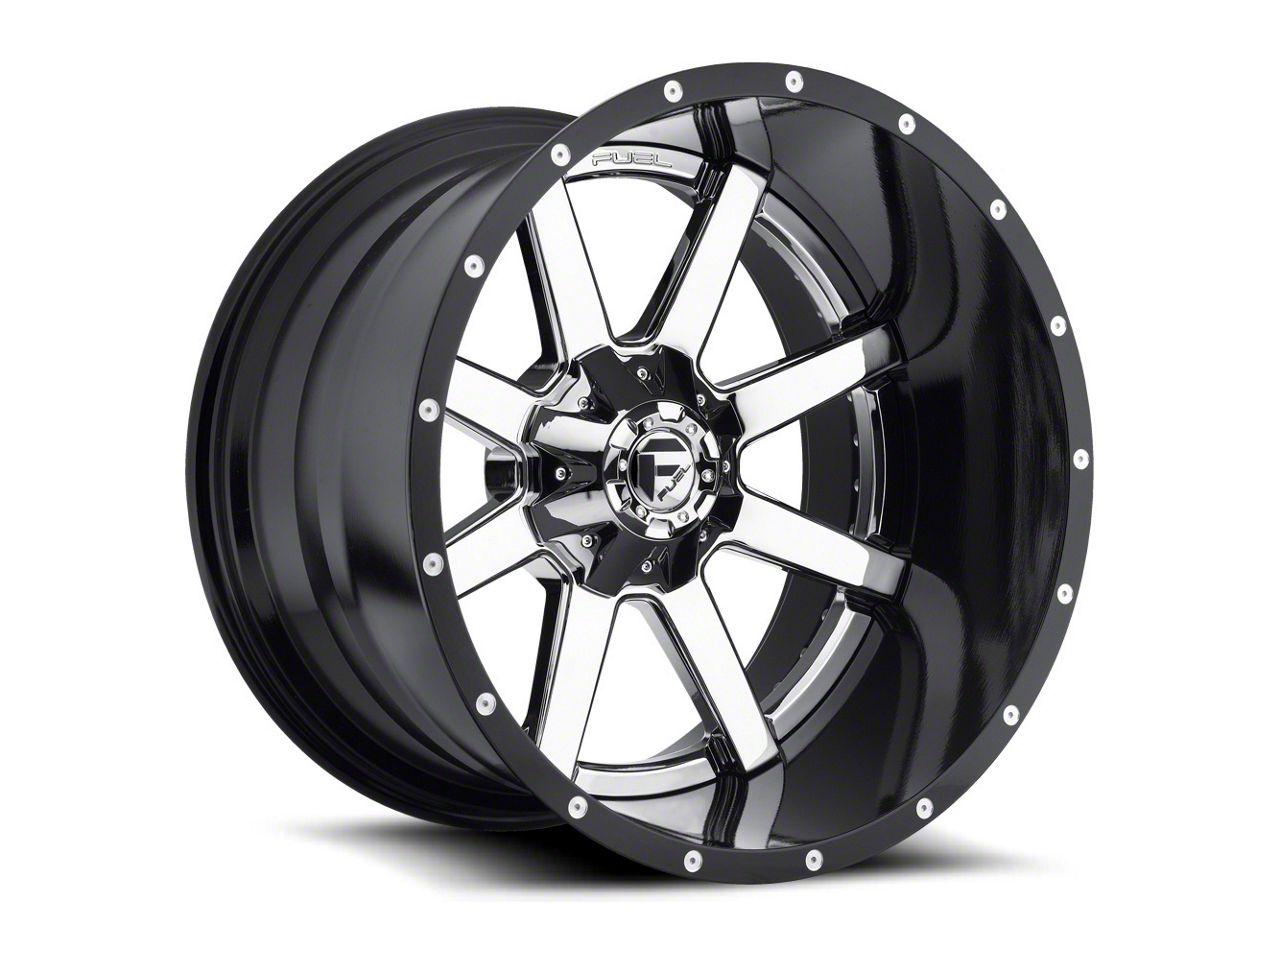 Fuel Wheels Maverick 2-Piece Chrome 6-Lug Wheel - 20x14 (99-18 Silverado 1500)